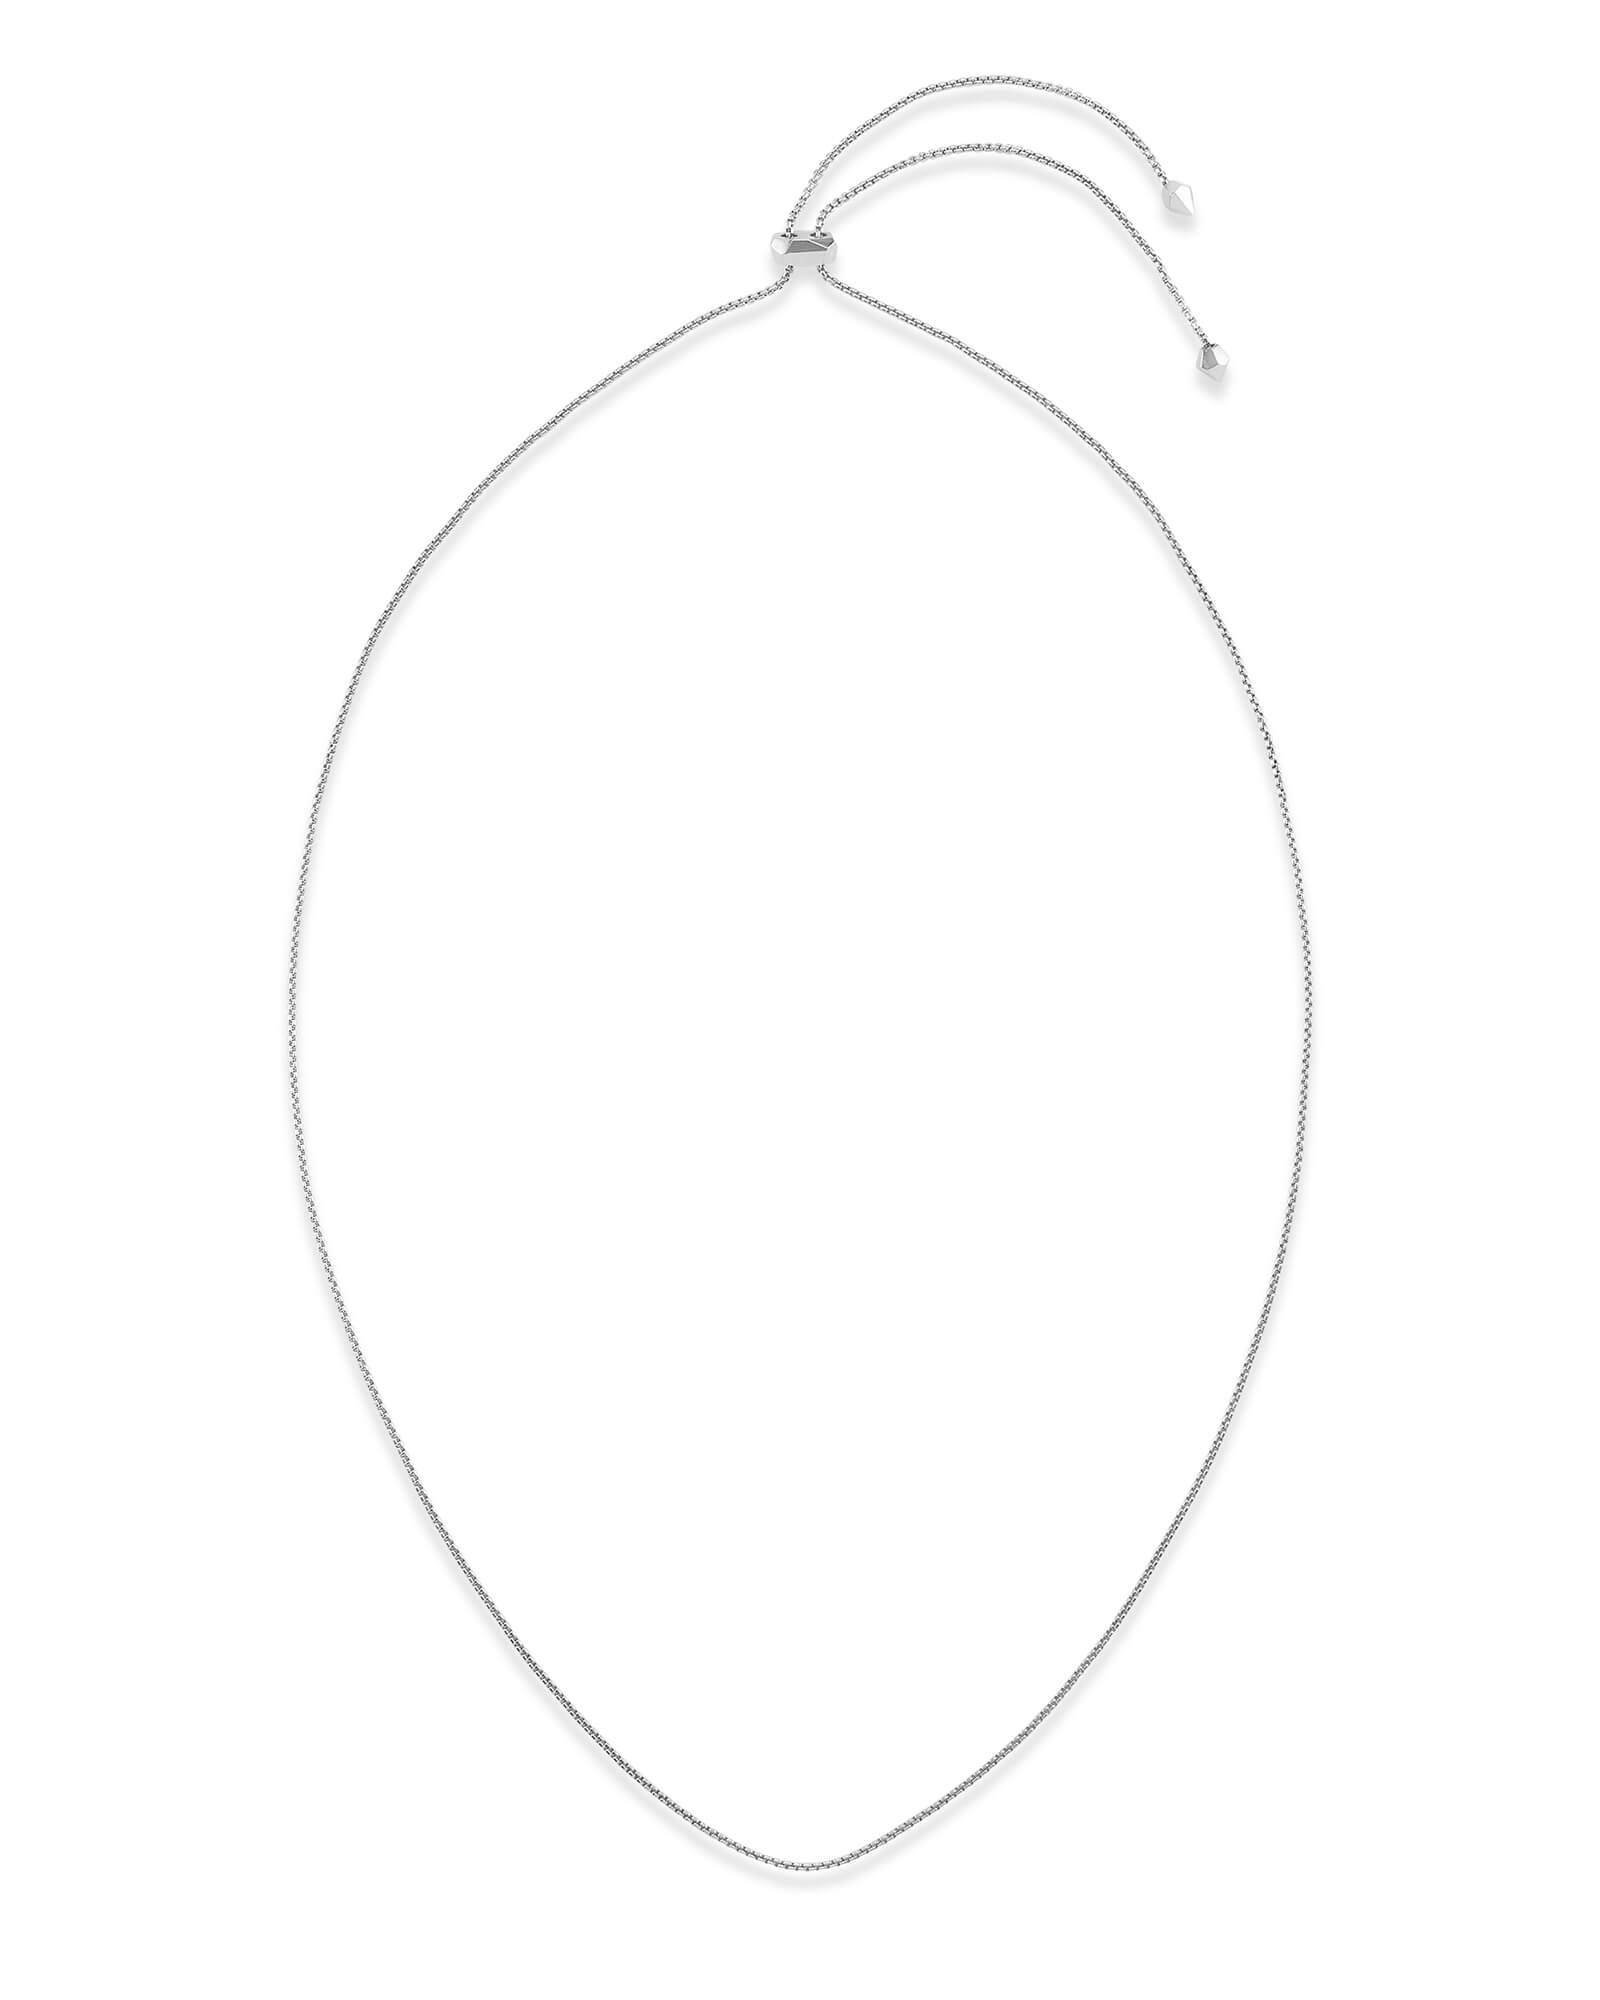 kendra-scott-thin-adjustable-chain-necklace-silver_00_lg.jpg